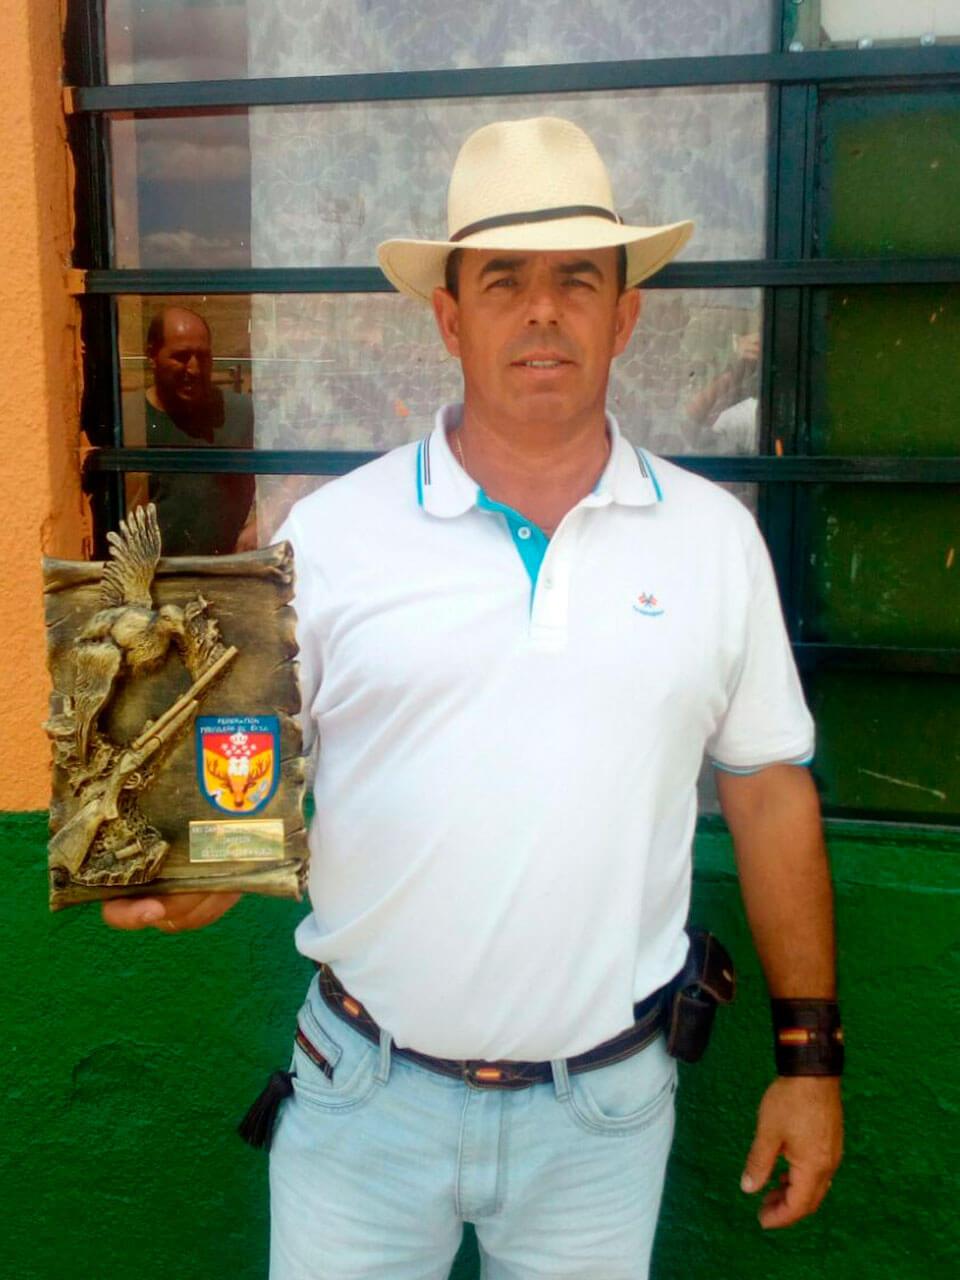 Campeon Autonómico Senior - D. Manuel Carbonell Ocaña